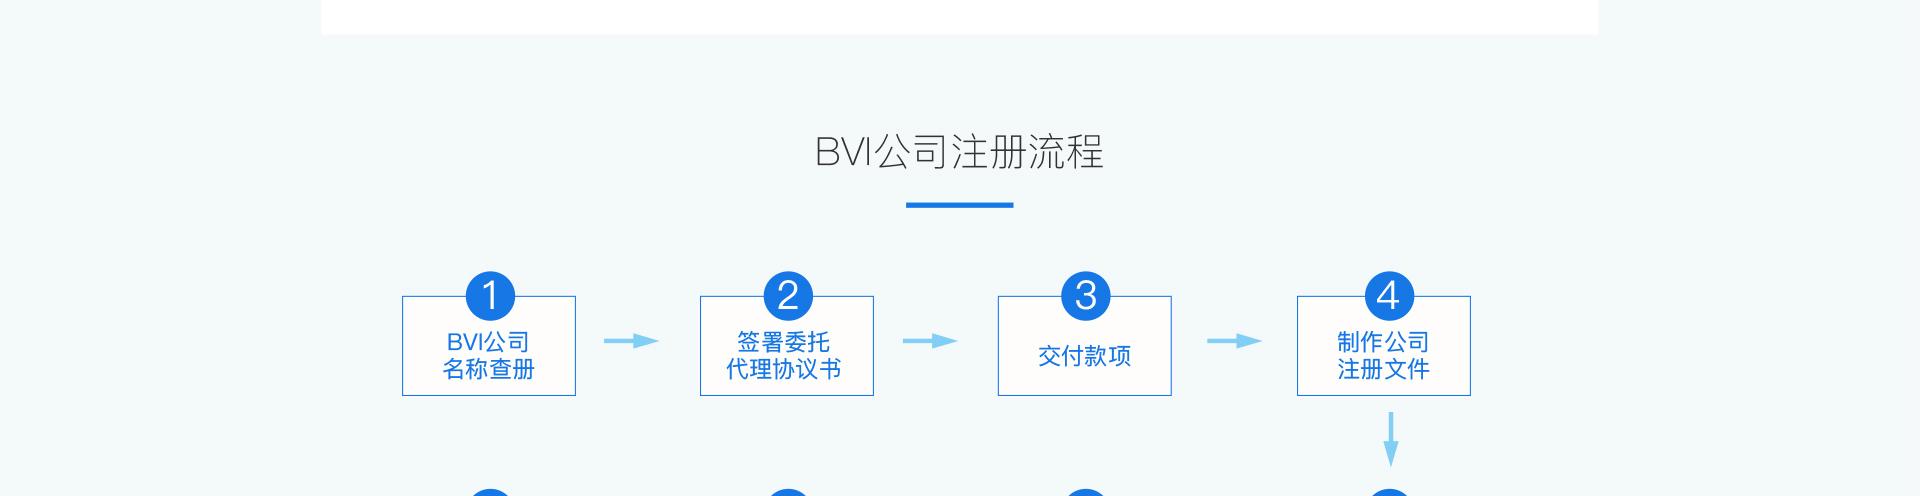 BVI公司注册_04.jpg